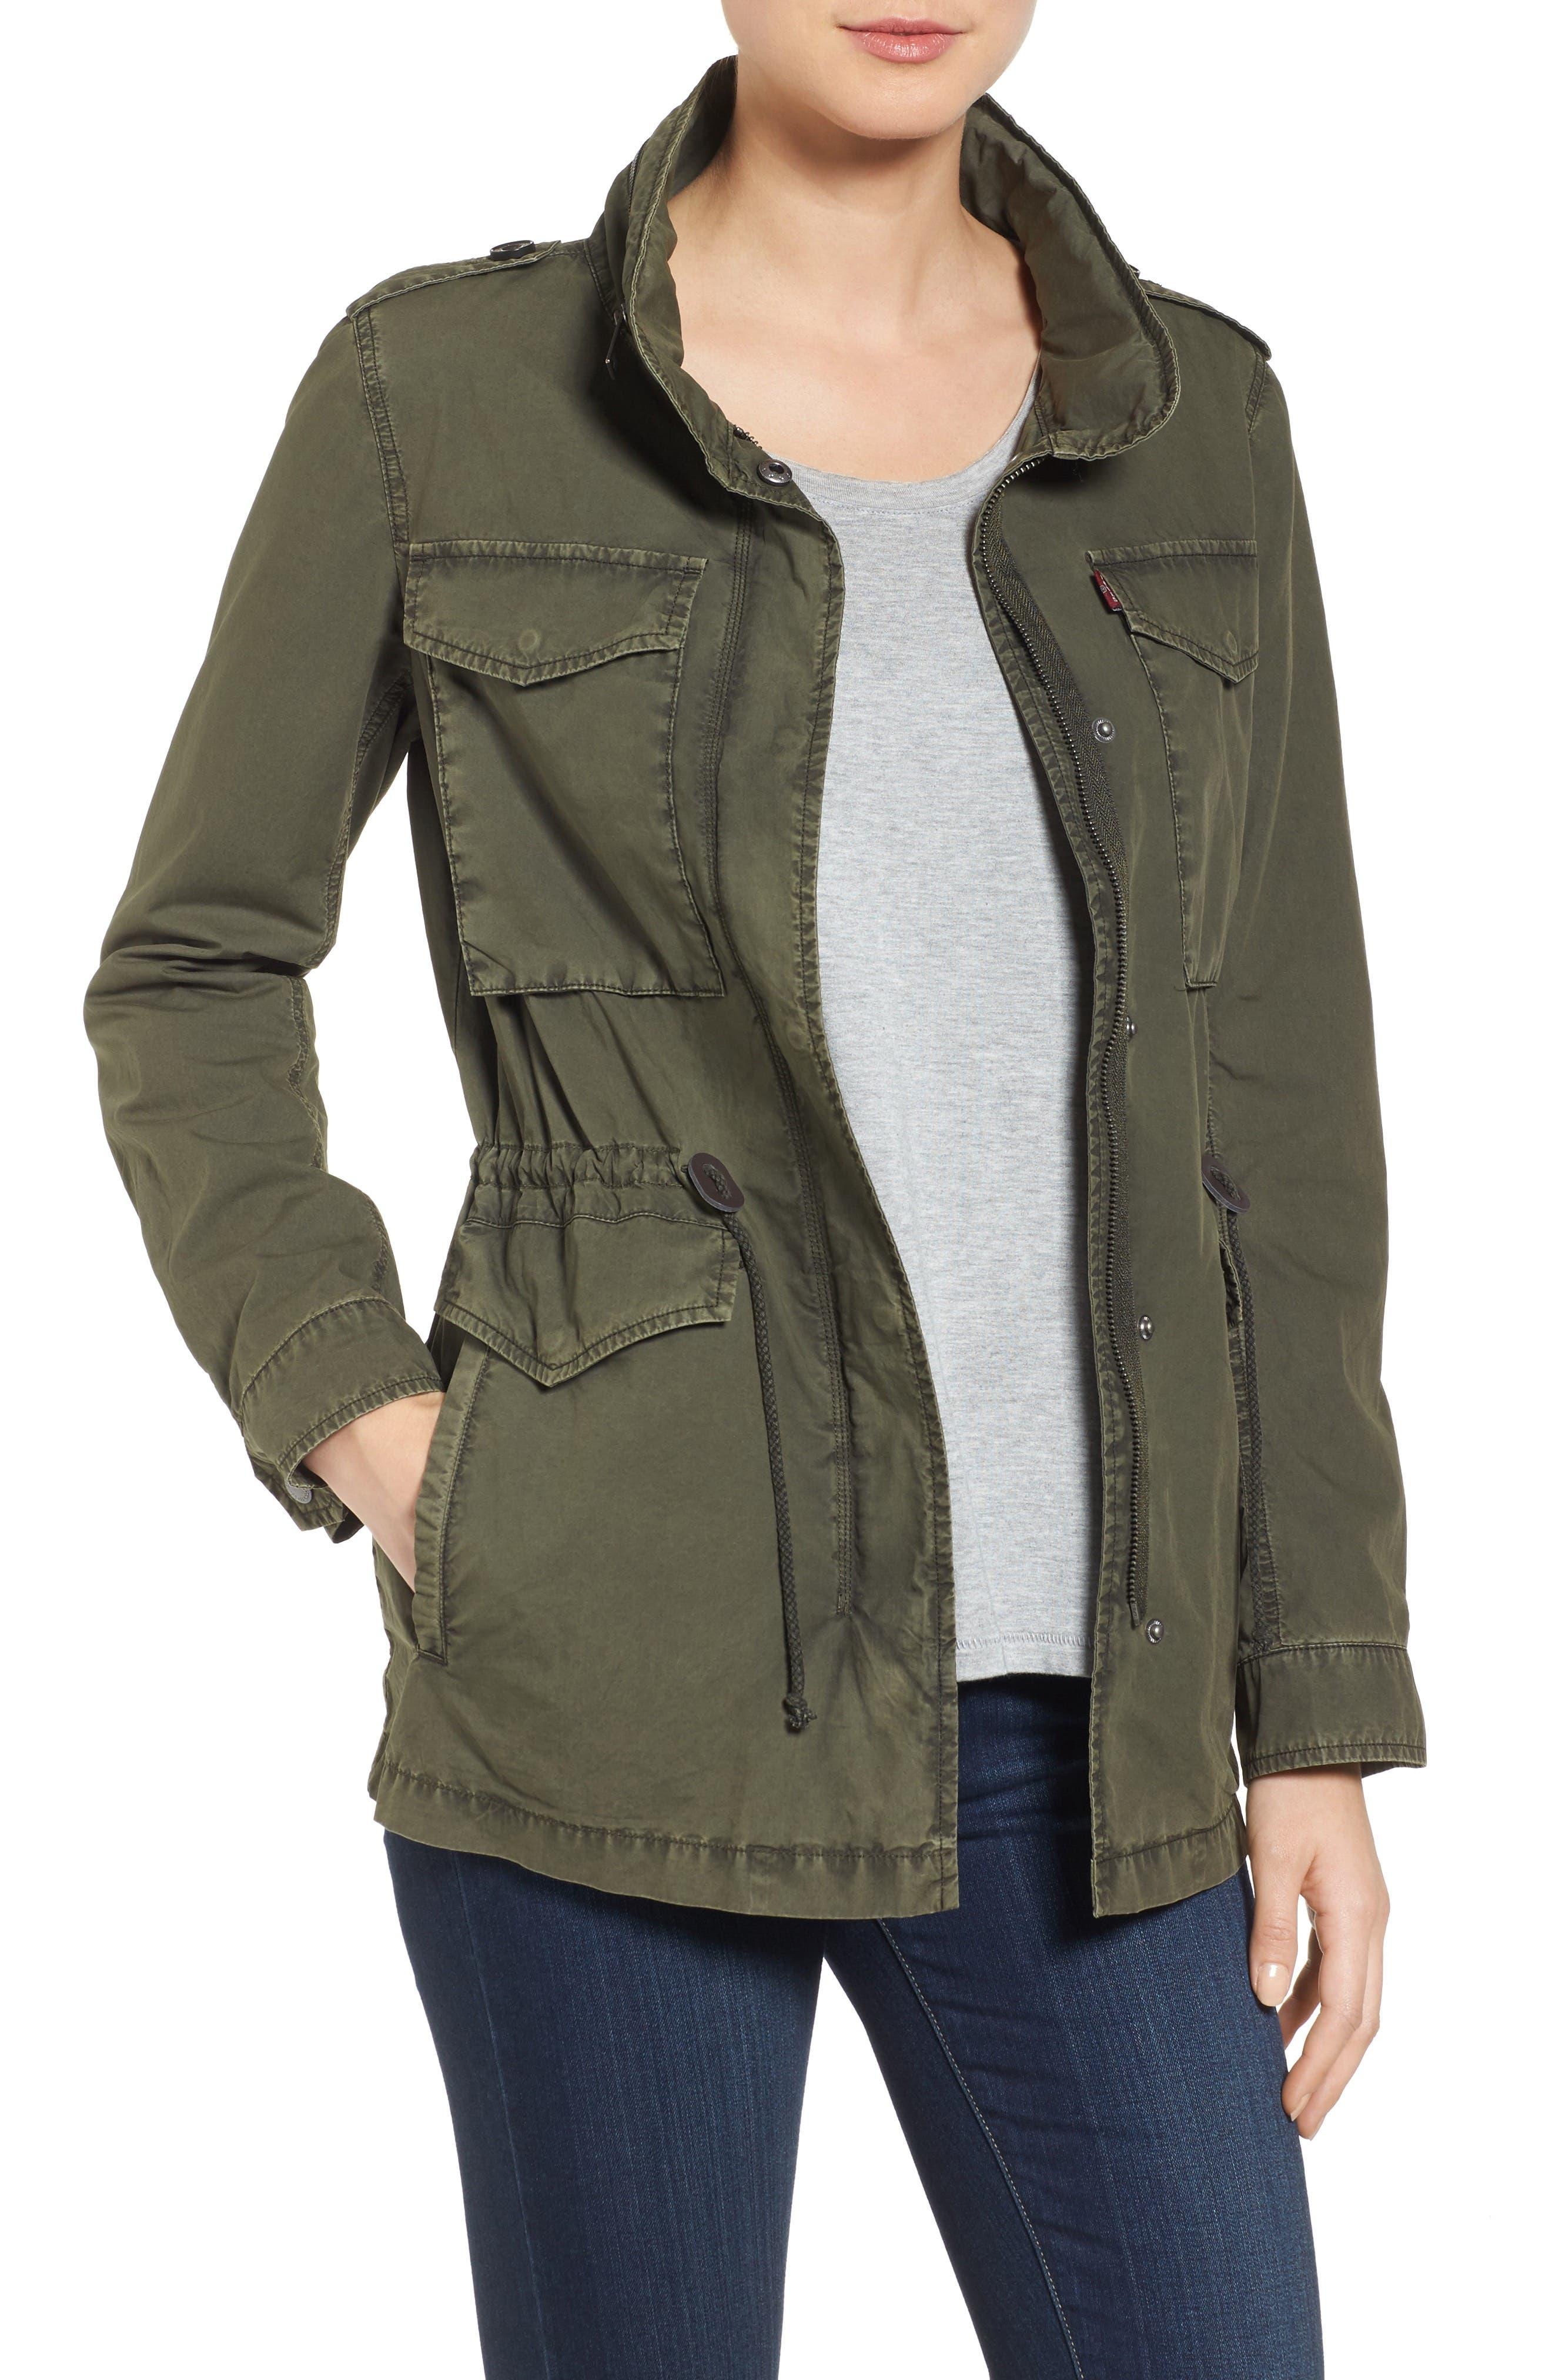 Alternate Image 1 Selected - Levi's® Four-Pocket Military Jacket